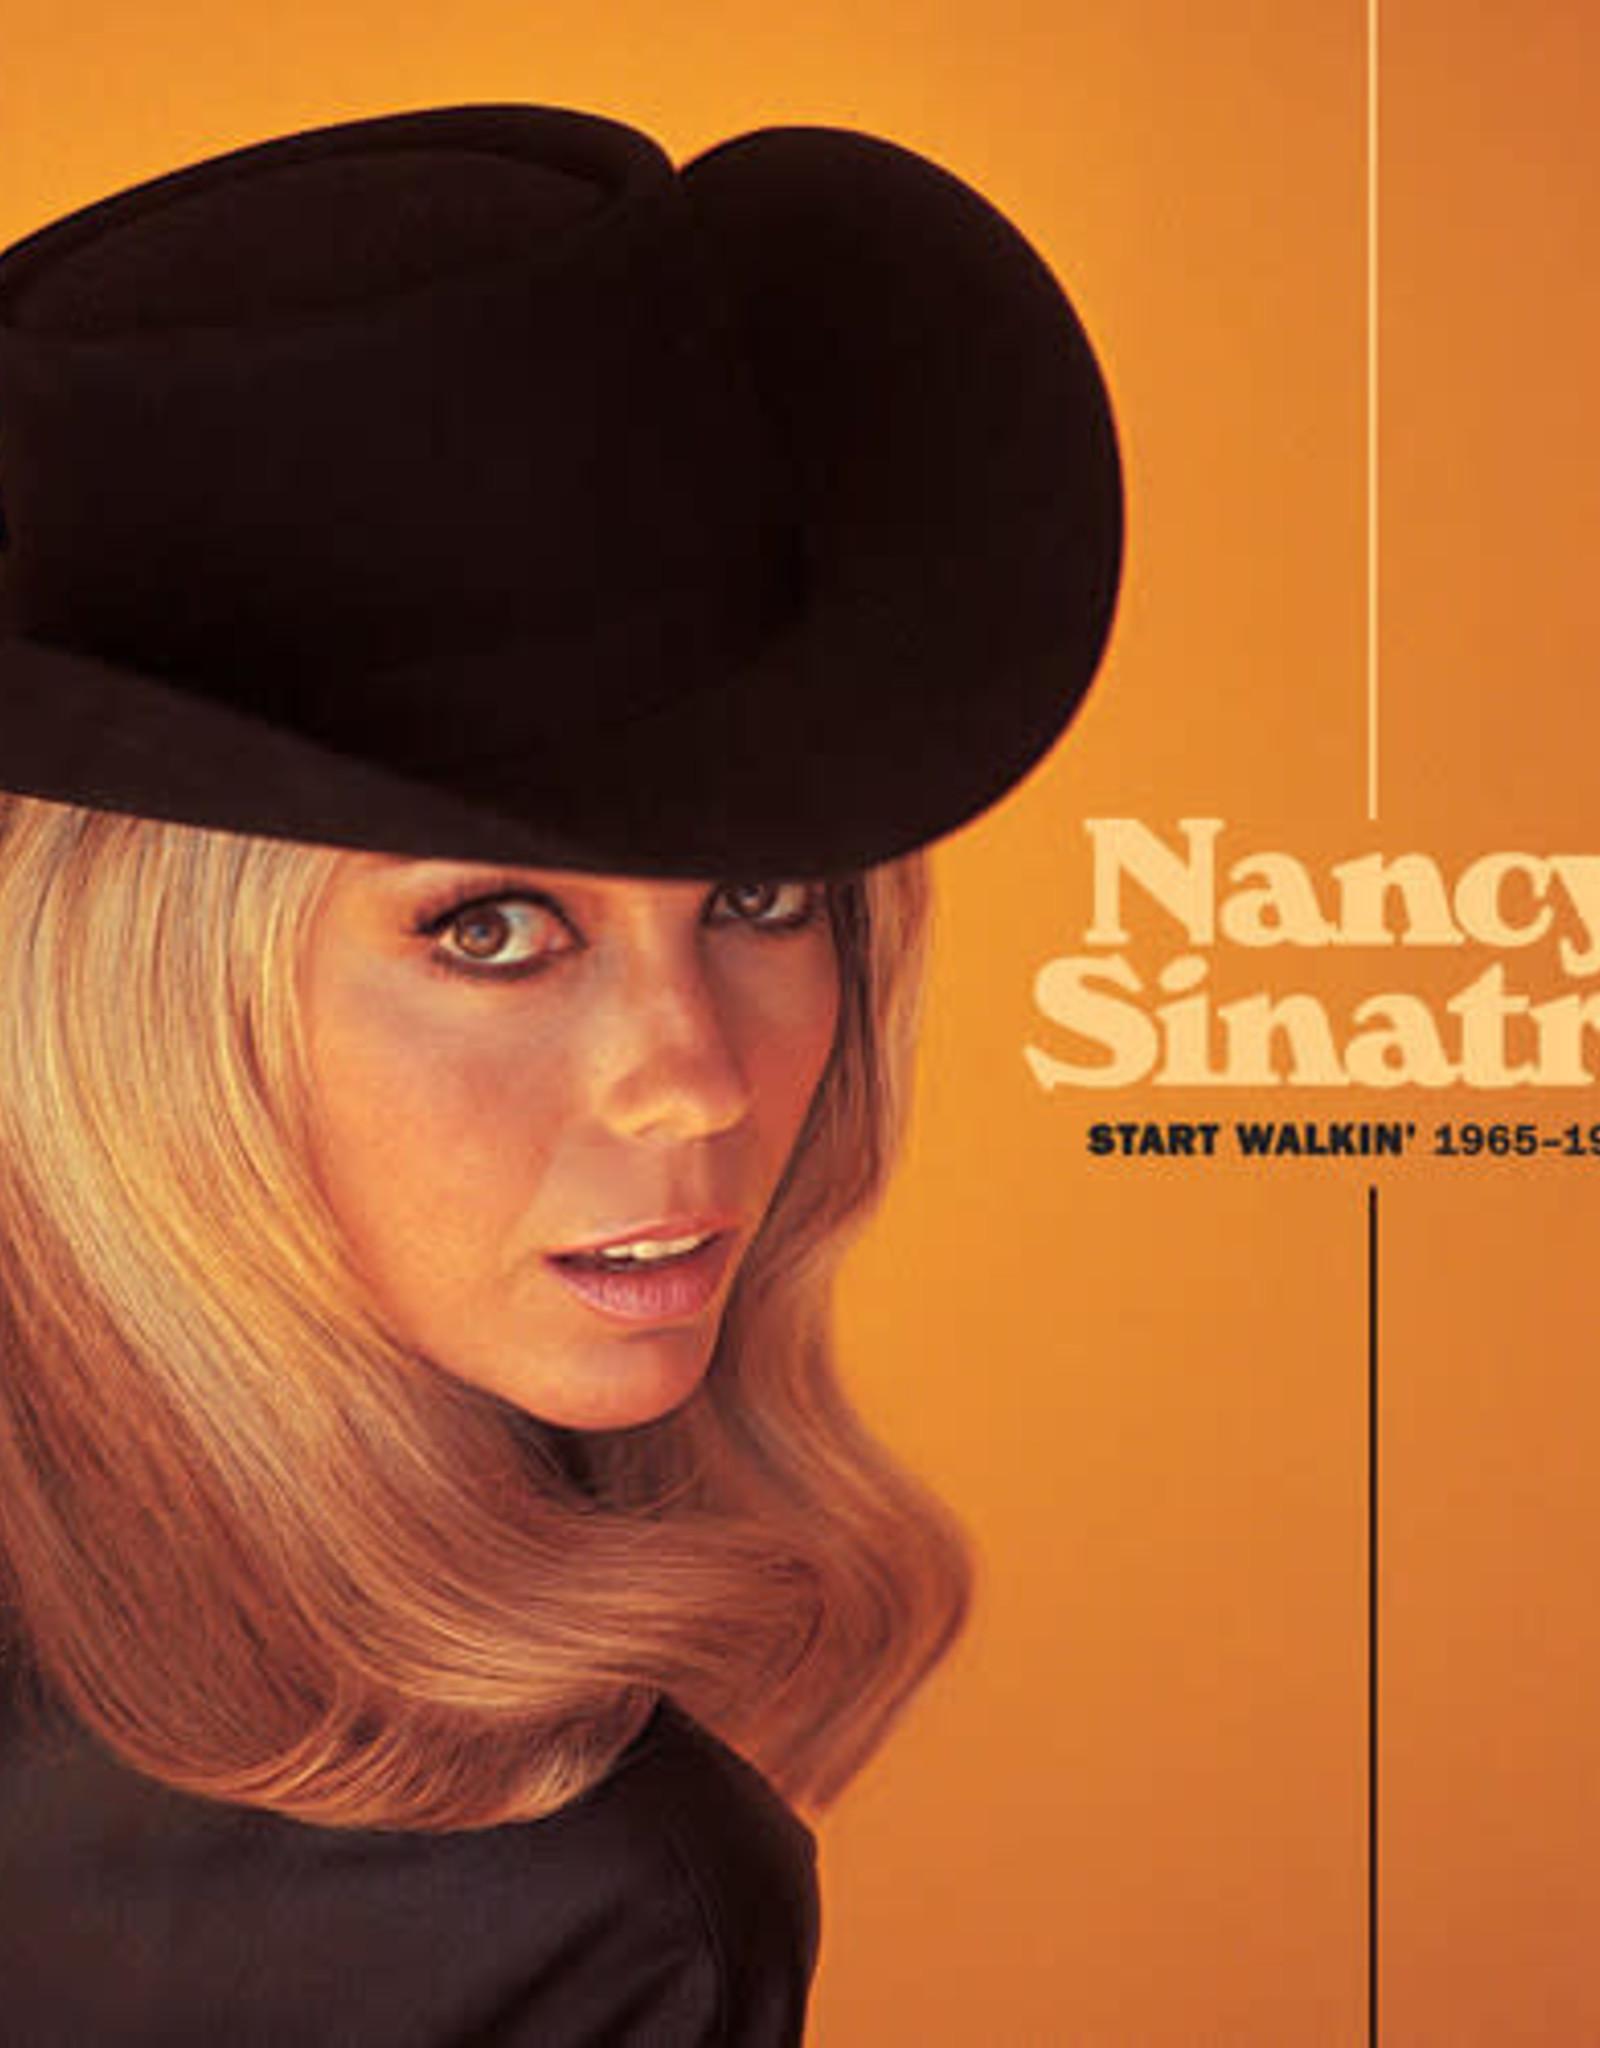 Nancy Sinatra - Start Walkin' 1965-1976 (Color Vinyl)